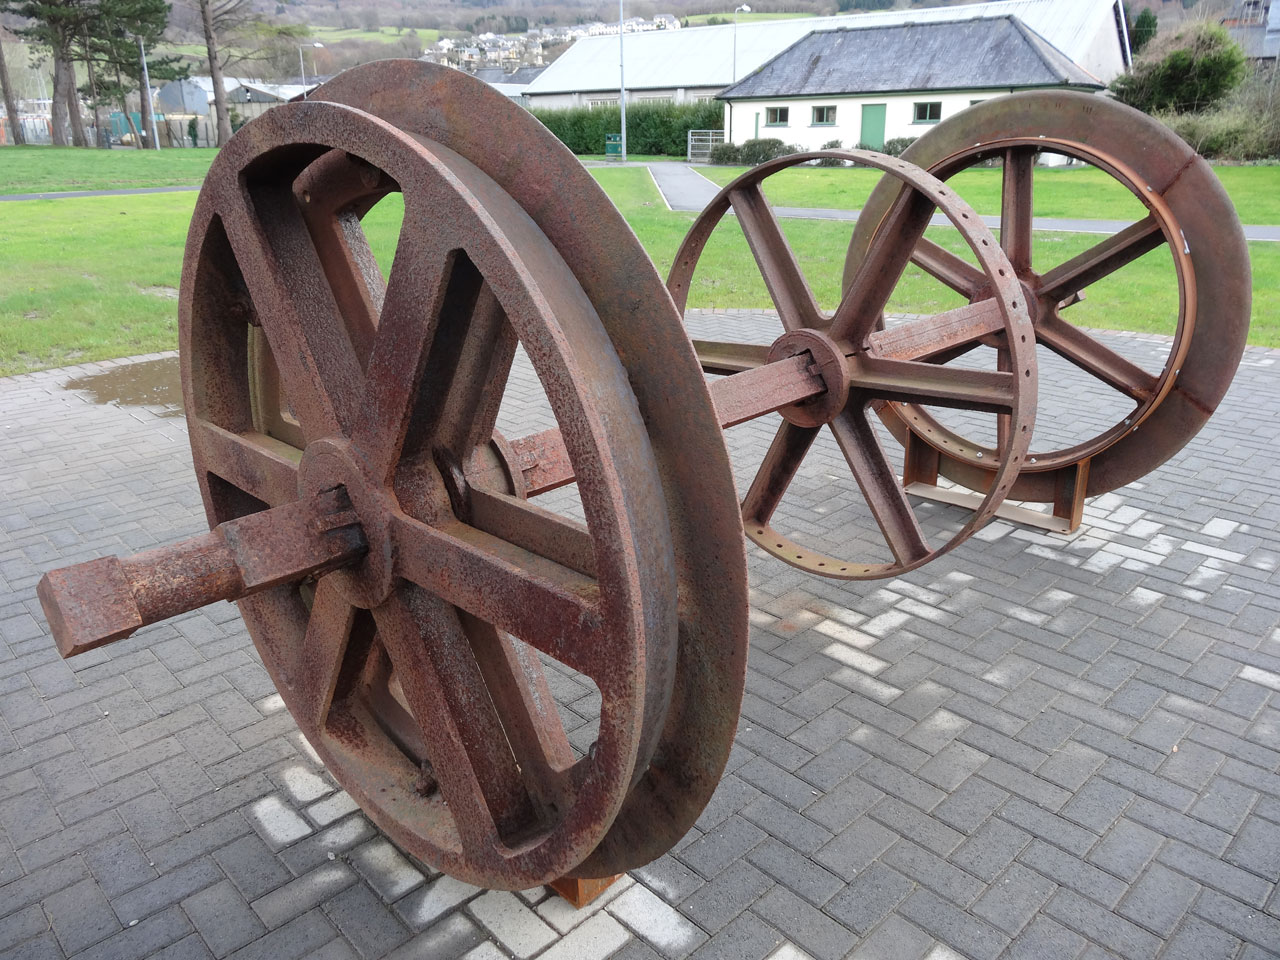 The Winding Wheel